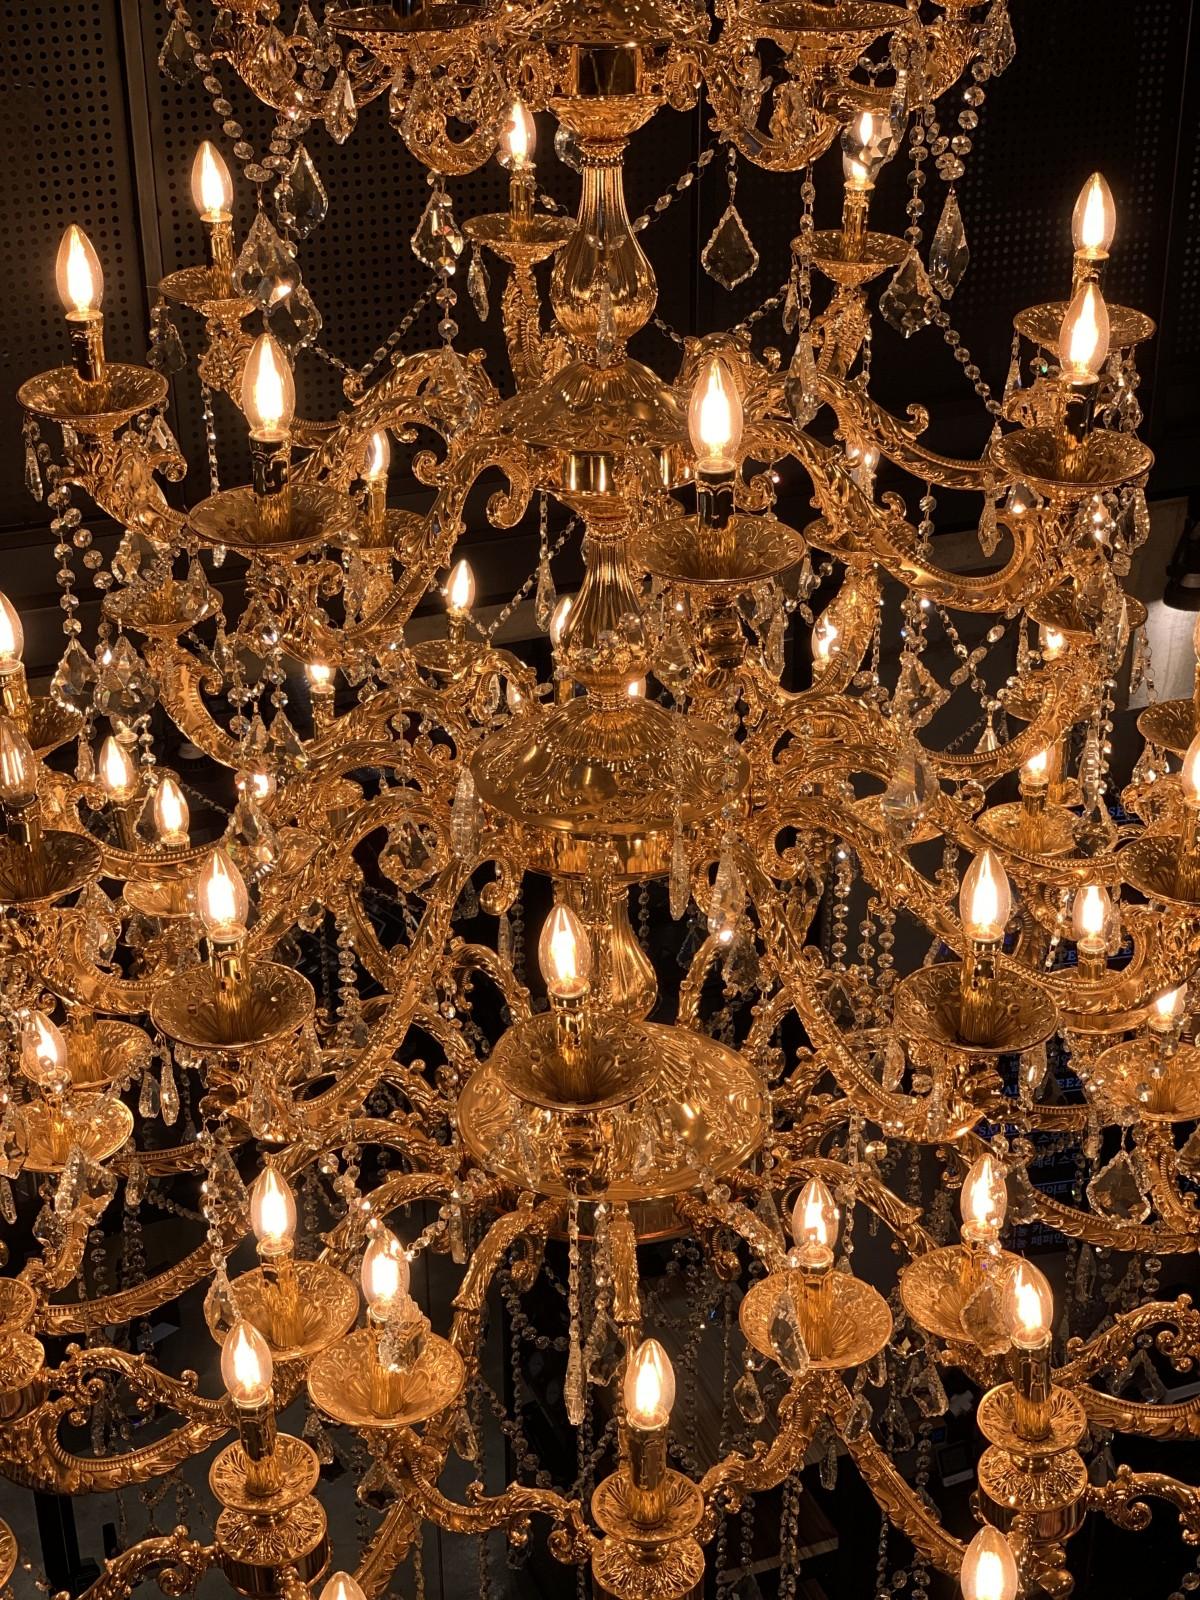 Free Images Chandelier Light Fixture Ceiling Fixture Lighting Accessory Incandescent Light Bulb Interior Design Lamp Candle Light Bulb 3024x4032 Jongsoo Hur 1628121 Free Stock Photos Pxhere